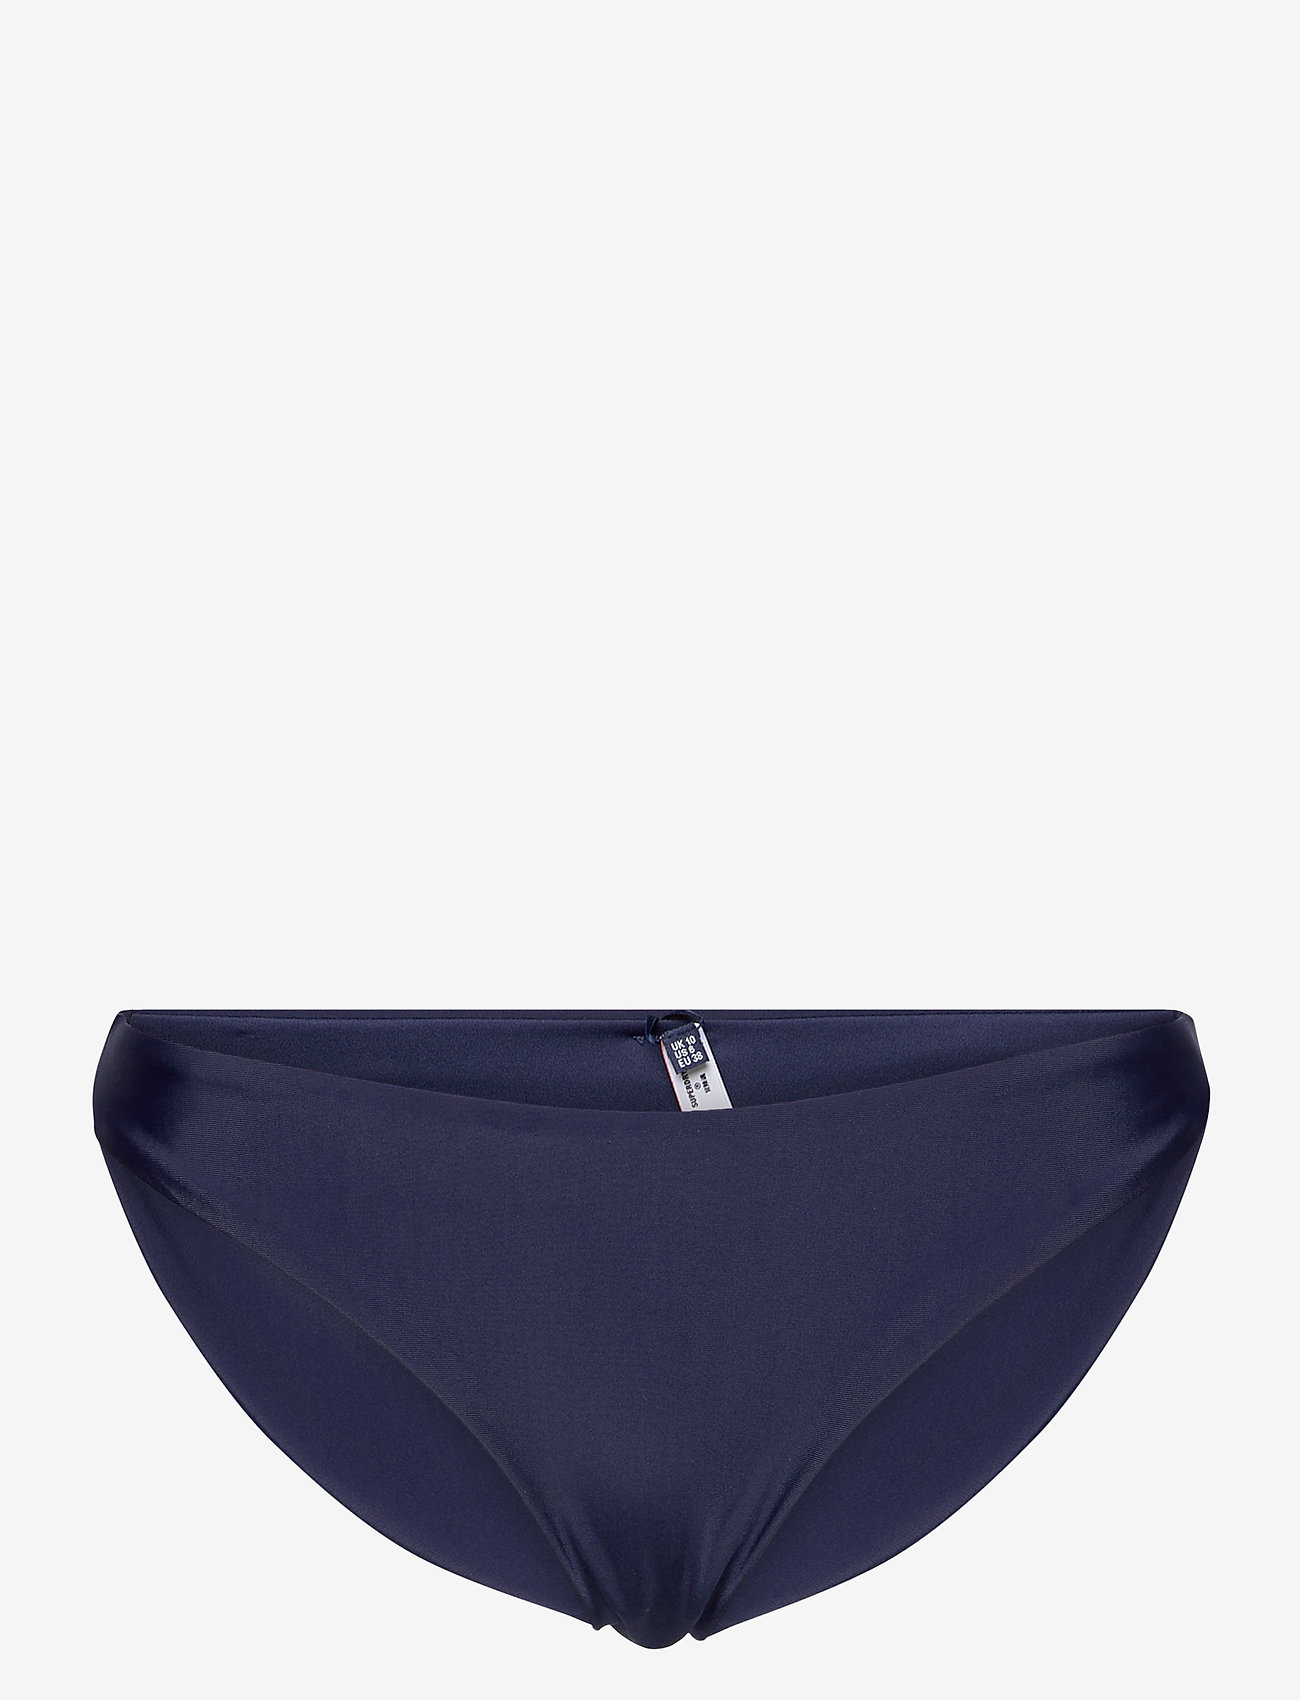 Superdry - SURF BIKINI BRIEF - bikini bottoms - navy - 0